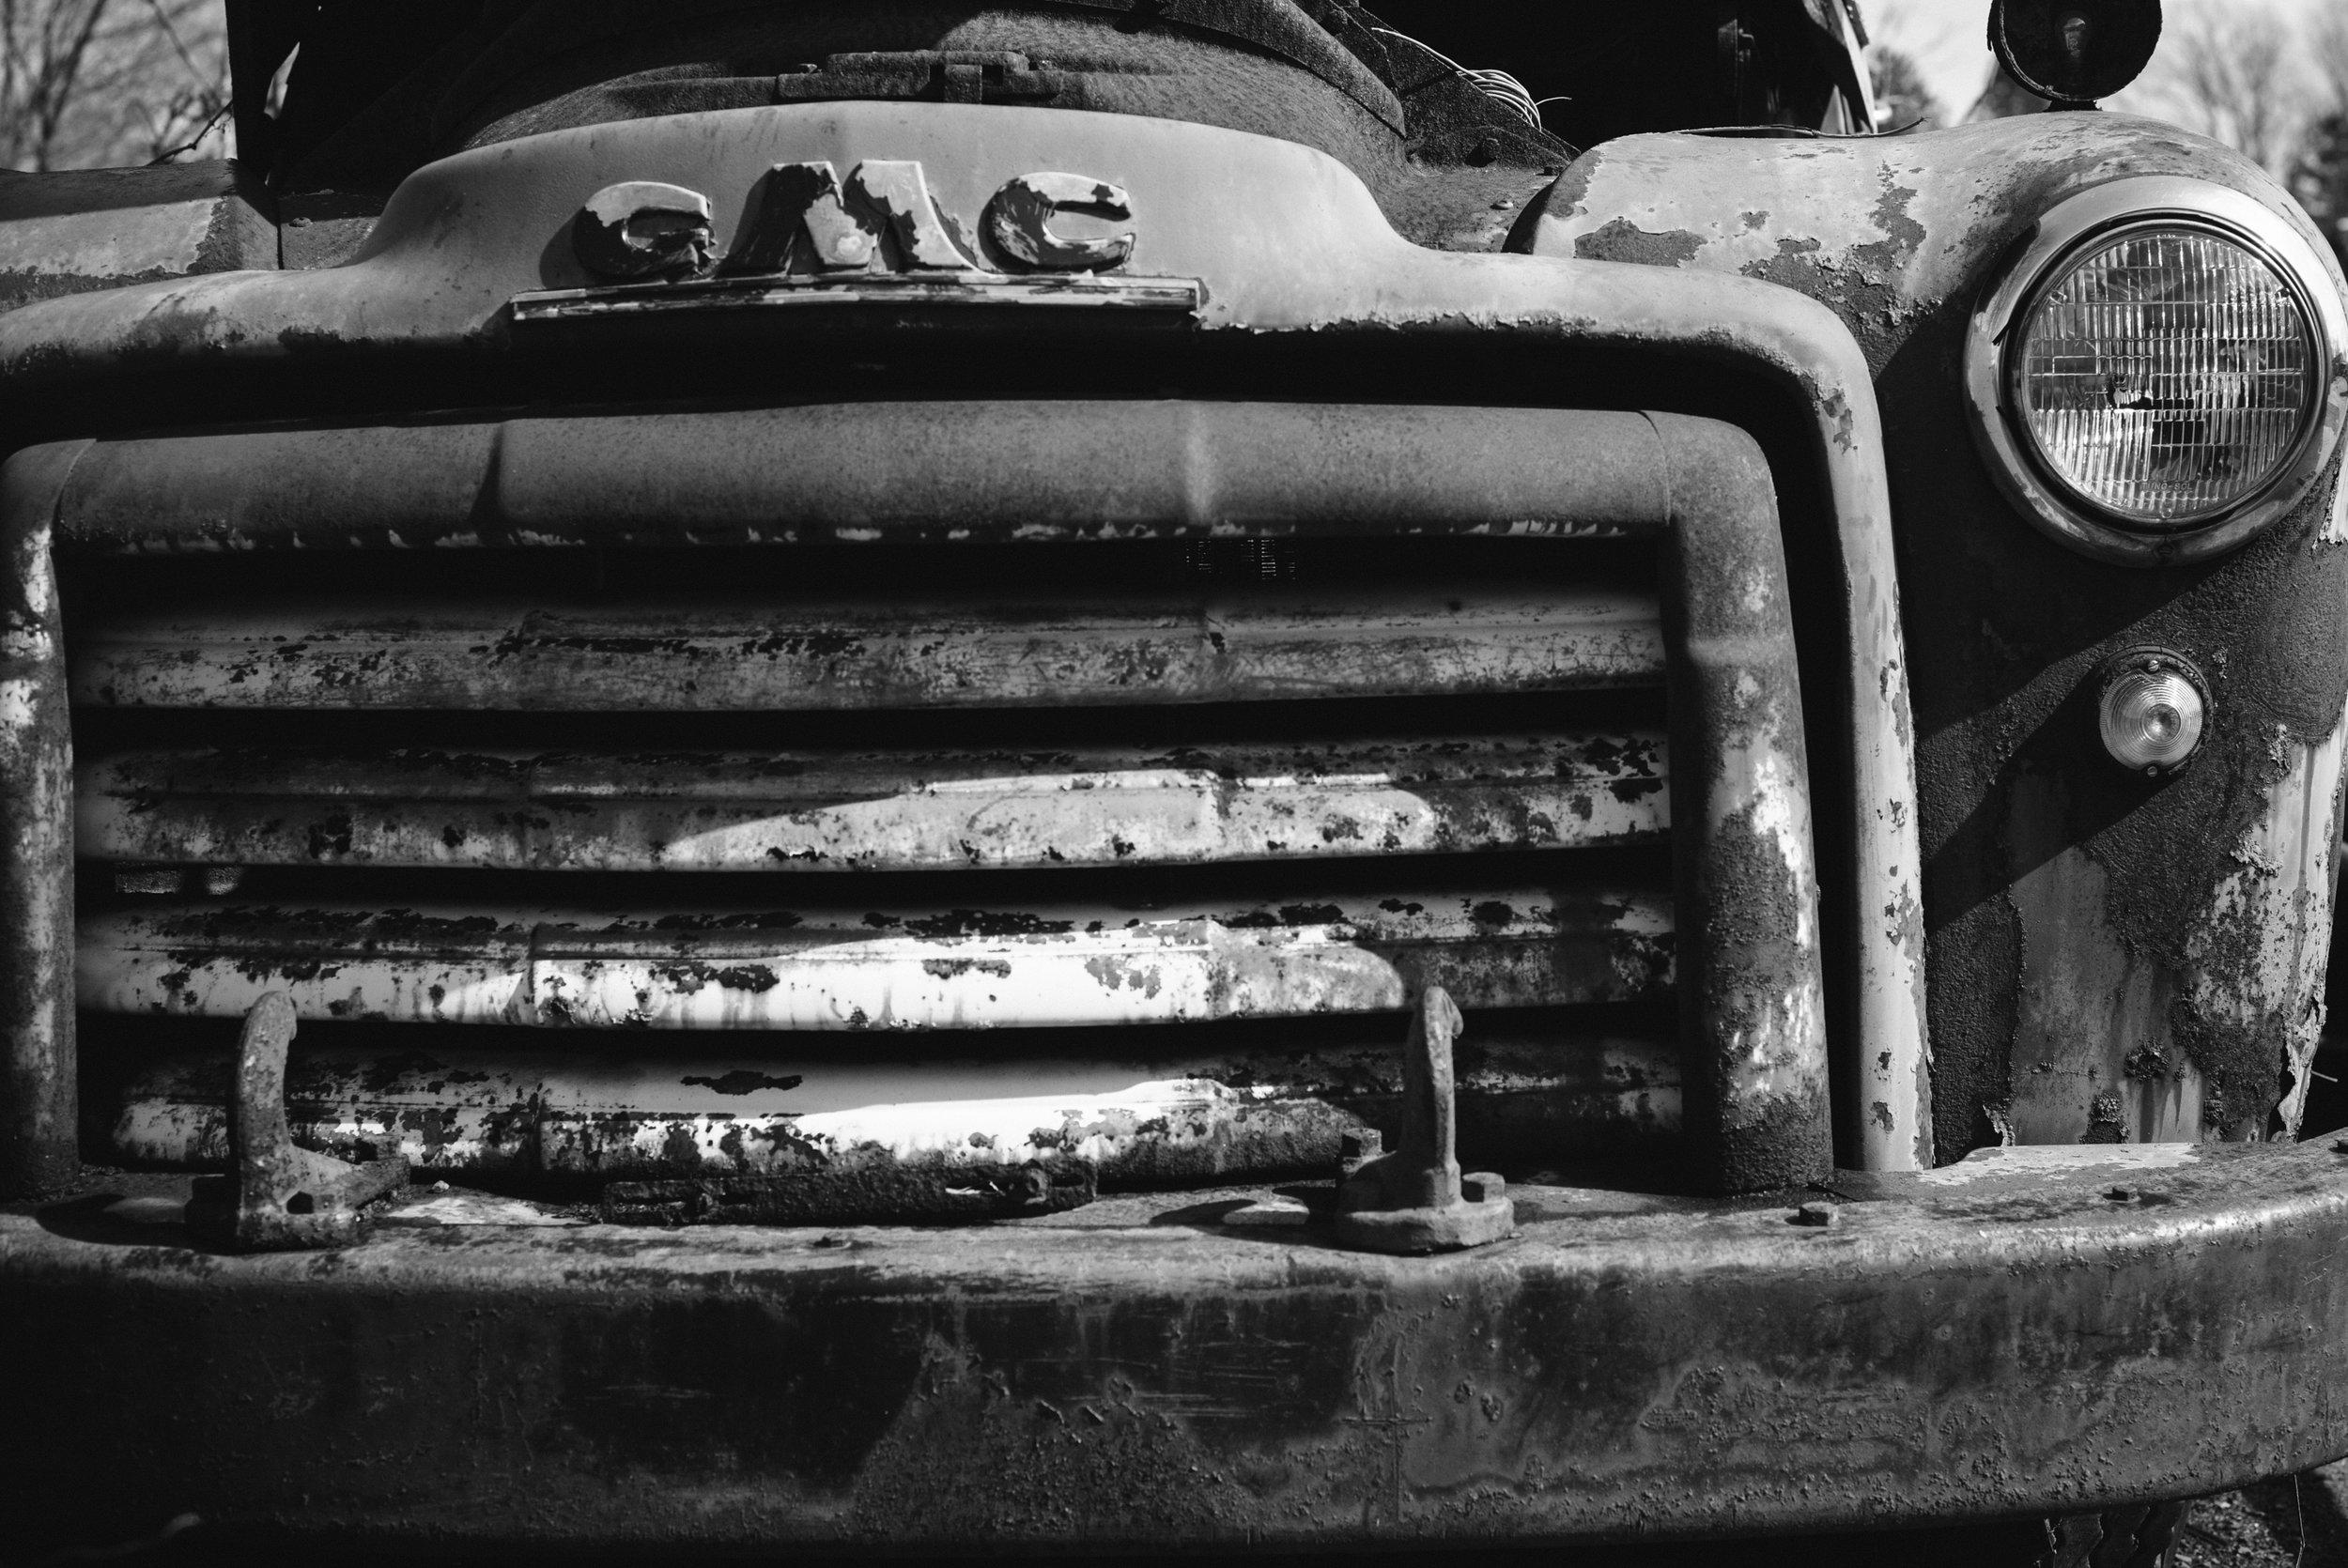 Leica M Typ 240 | Konica M-Hexanon 50mm f/2.0